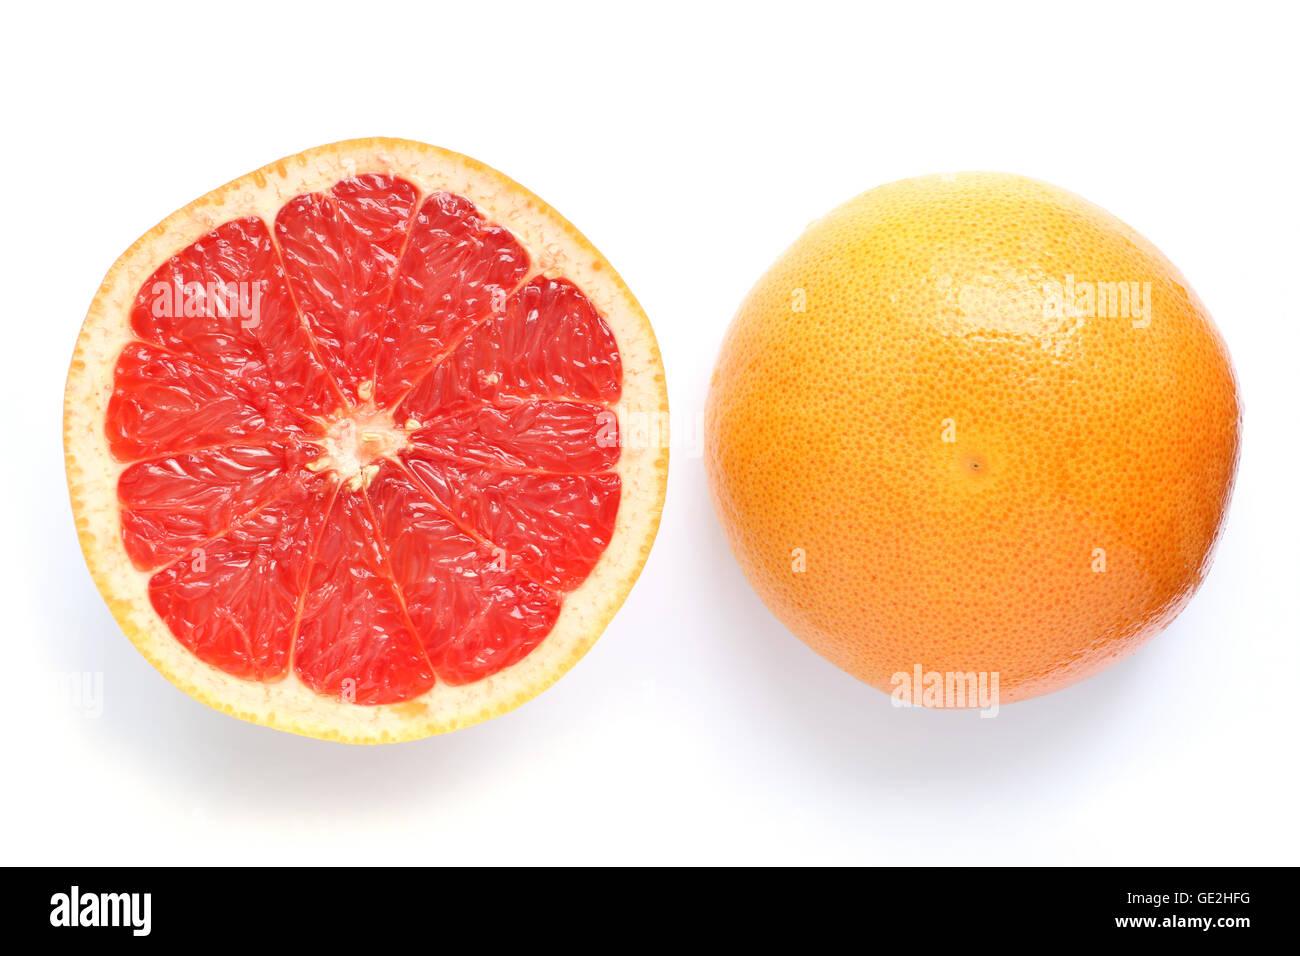 pink grapefruit slice isolated #2 - Stock Image